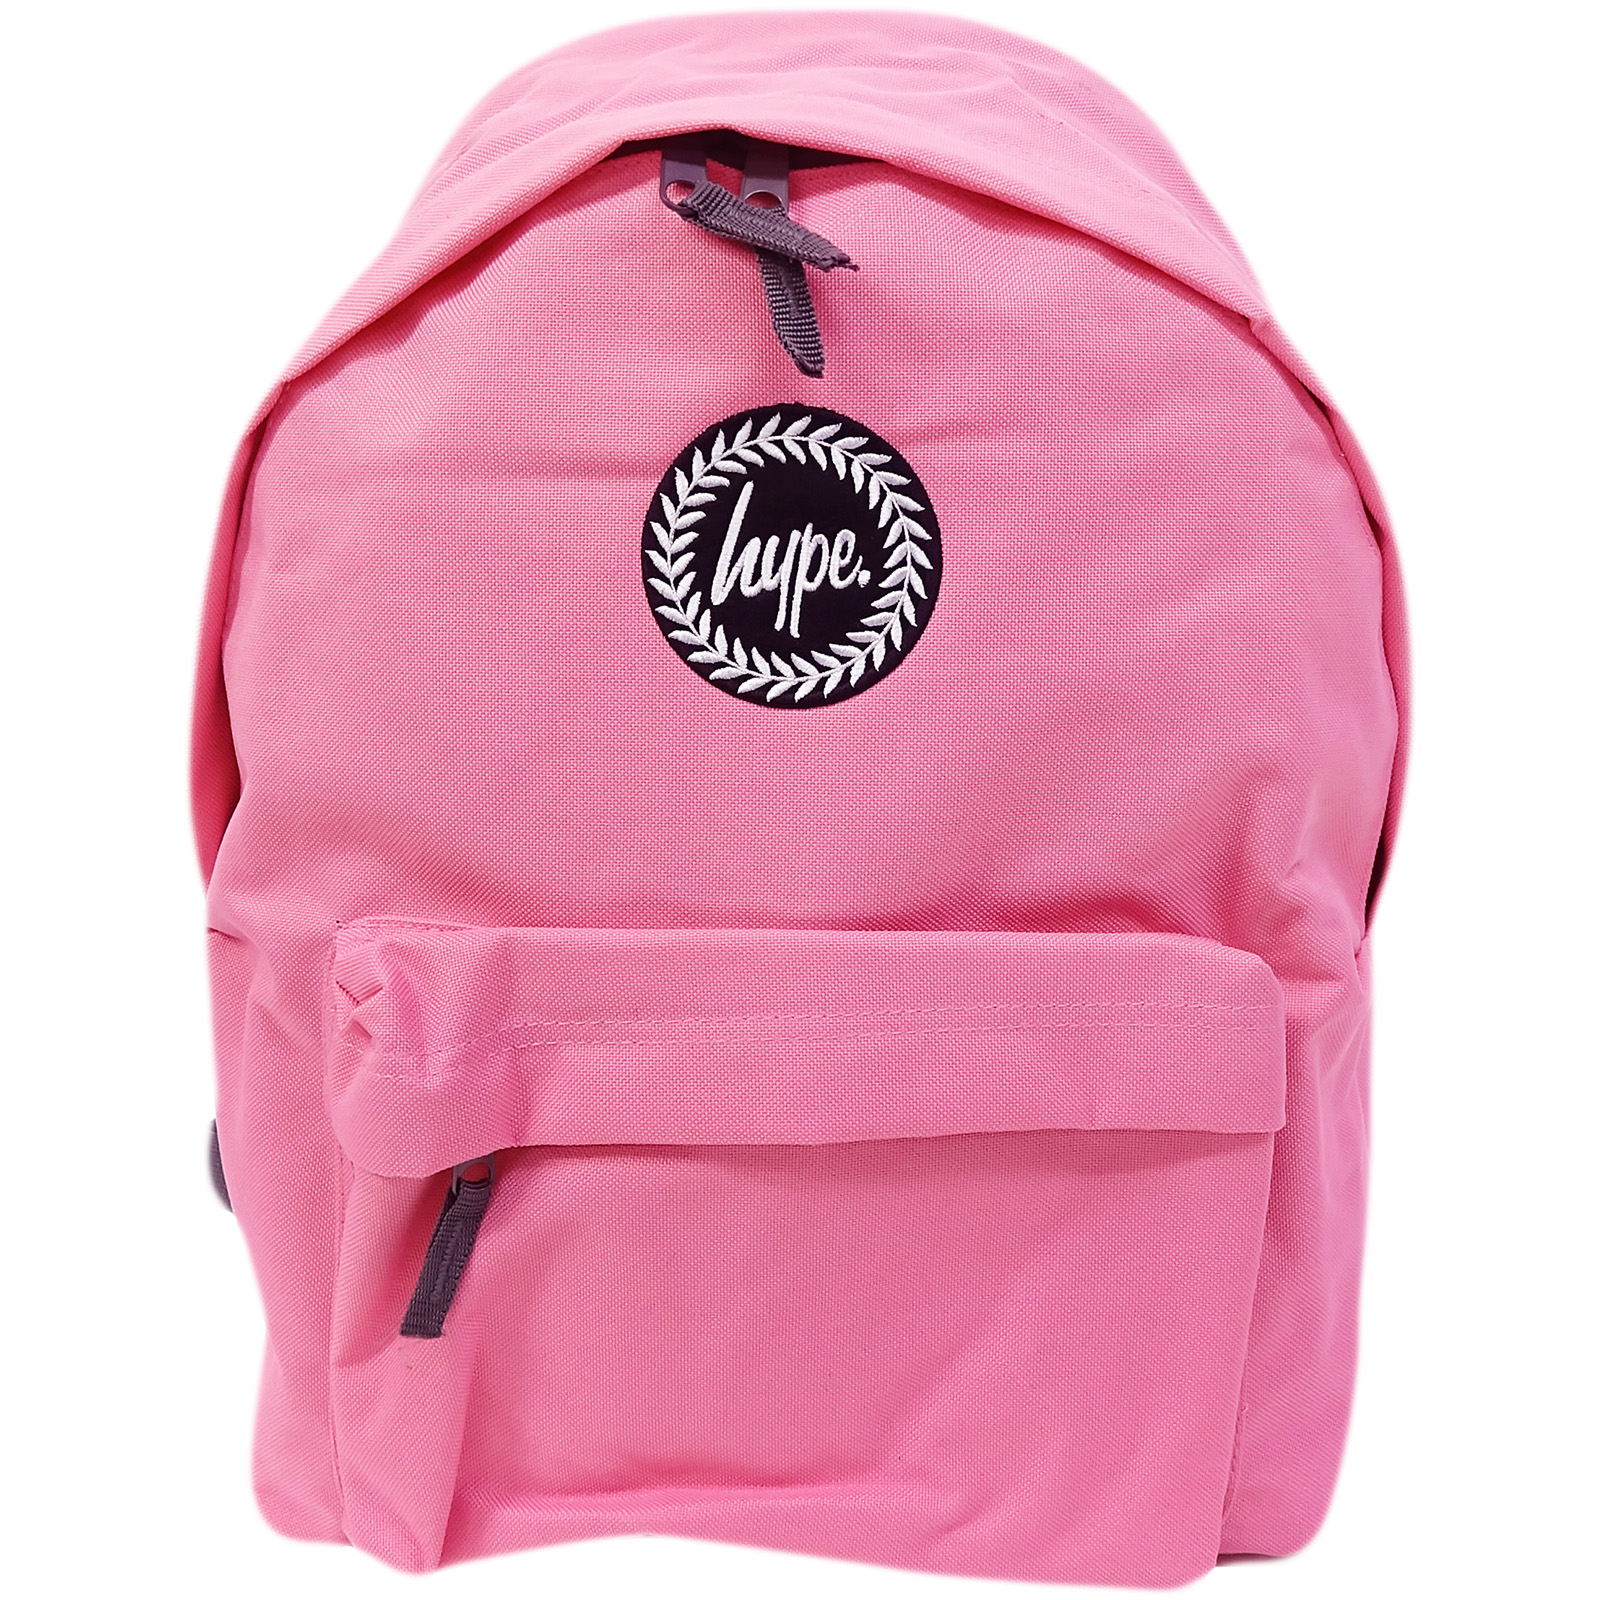 Just Hype Backpack Plain True Pink Bag 5056120681747  9b8b91b72124c